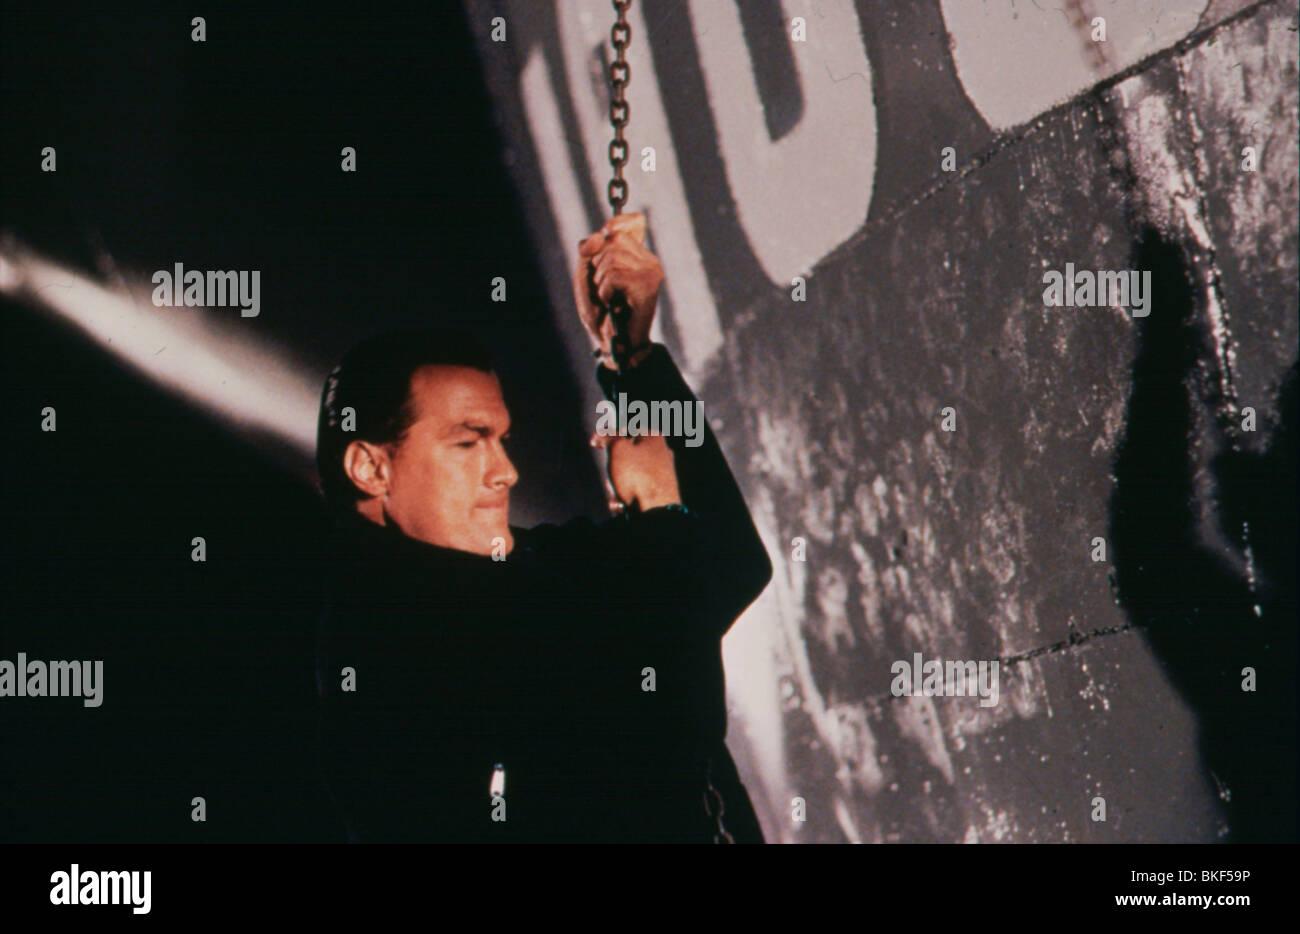 UNDER SIEGE (1992) STEVEN SEAGAL UNSG 017 - Stock Image